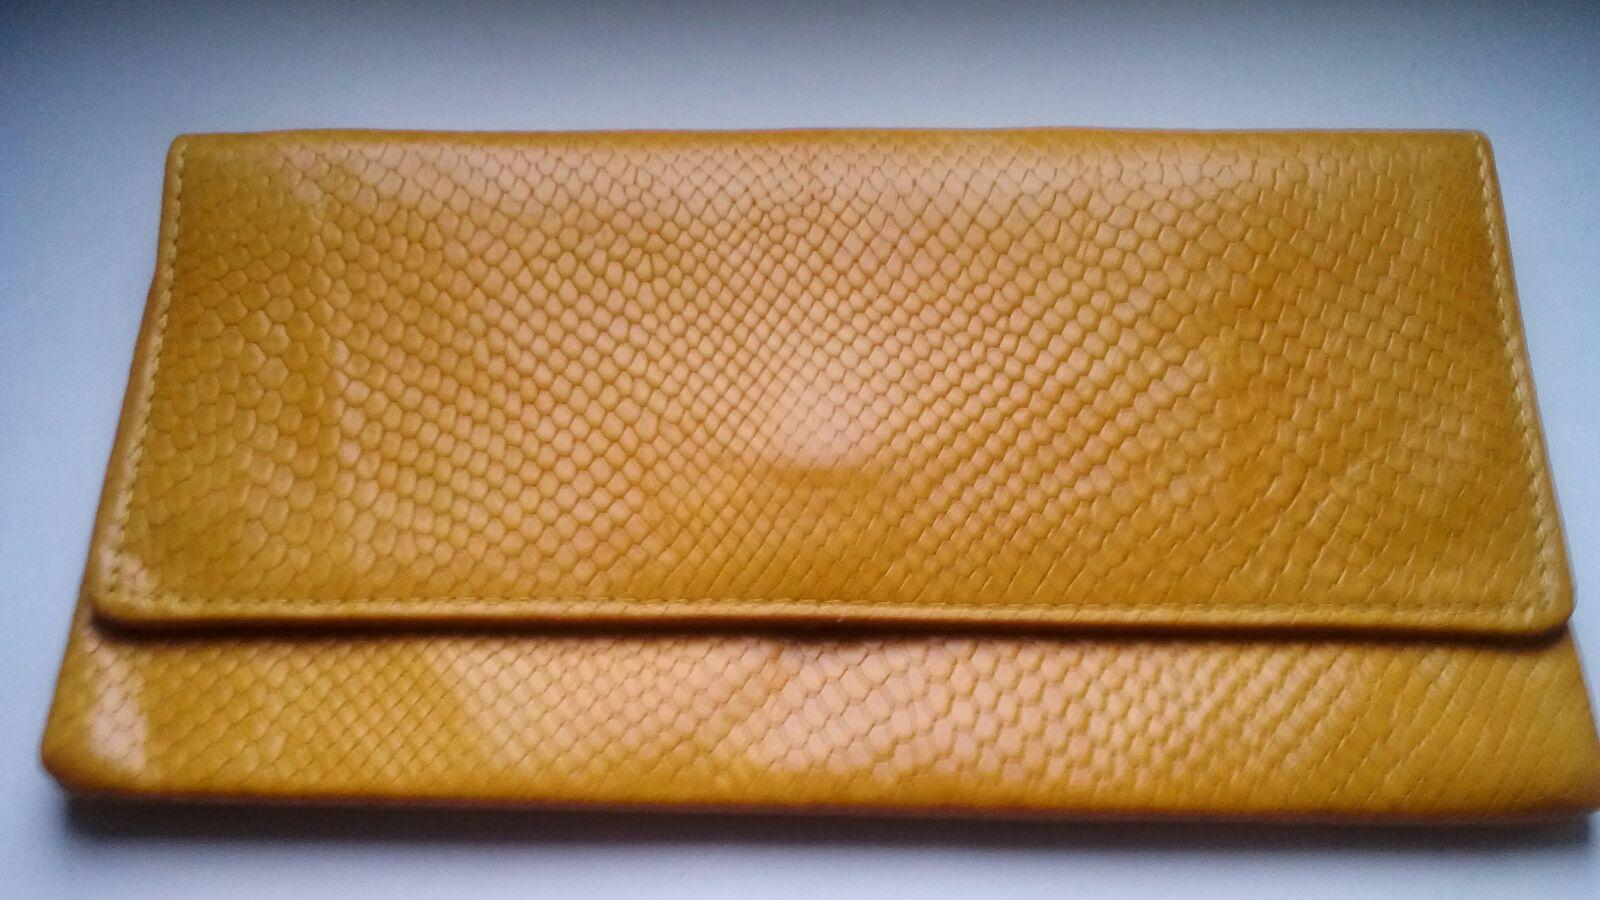 0c3c9cb033ec9 Kopertówka Etui Bags London Kate Middleton Nowa 7305645200